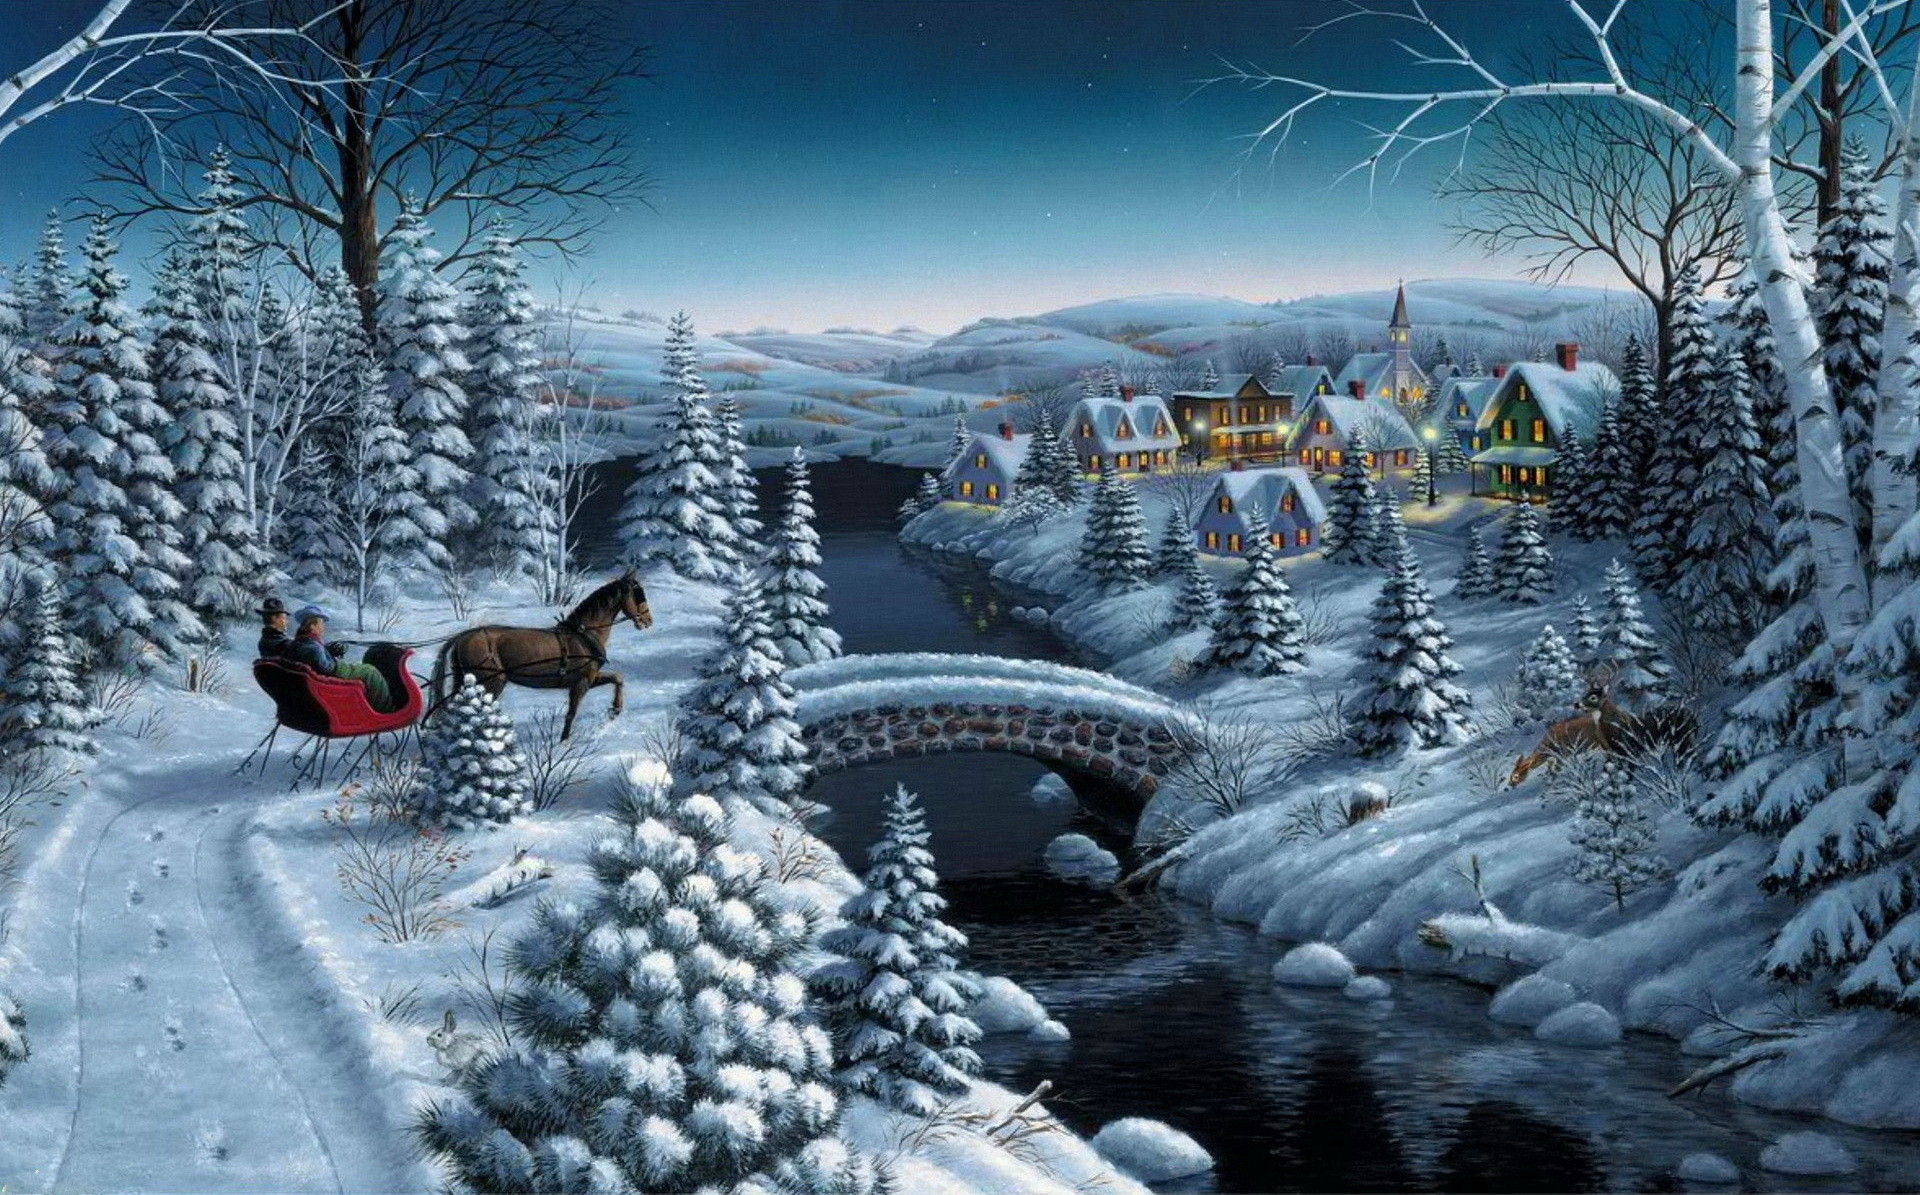 Anticipation – Winter Wallpaper ID 1279077 – Desktop Nexus Nature